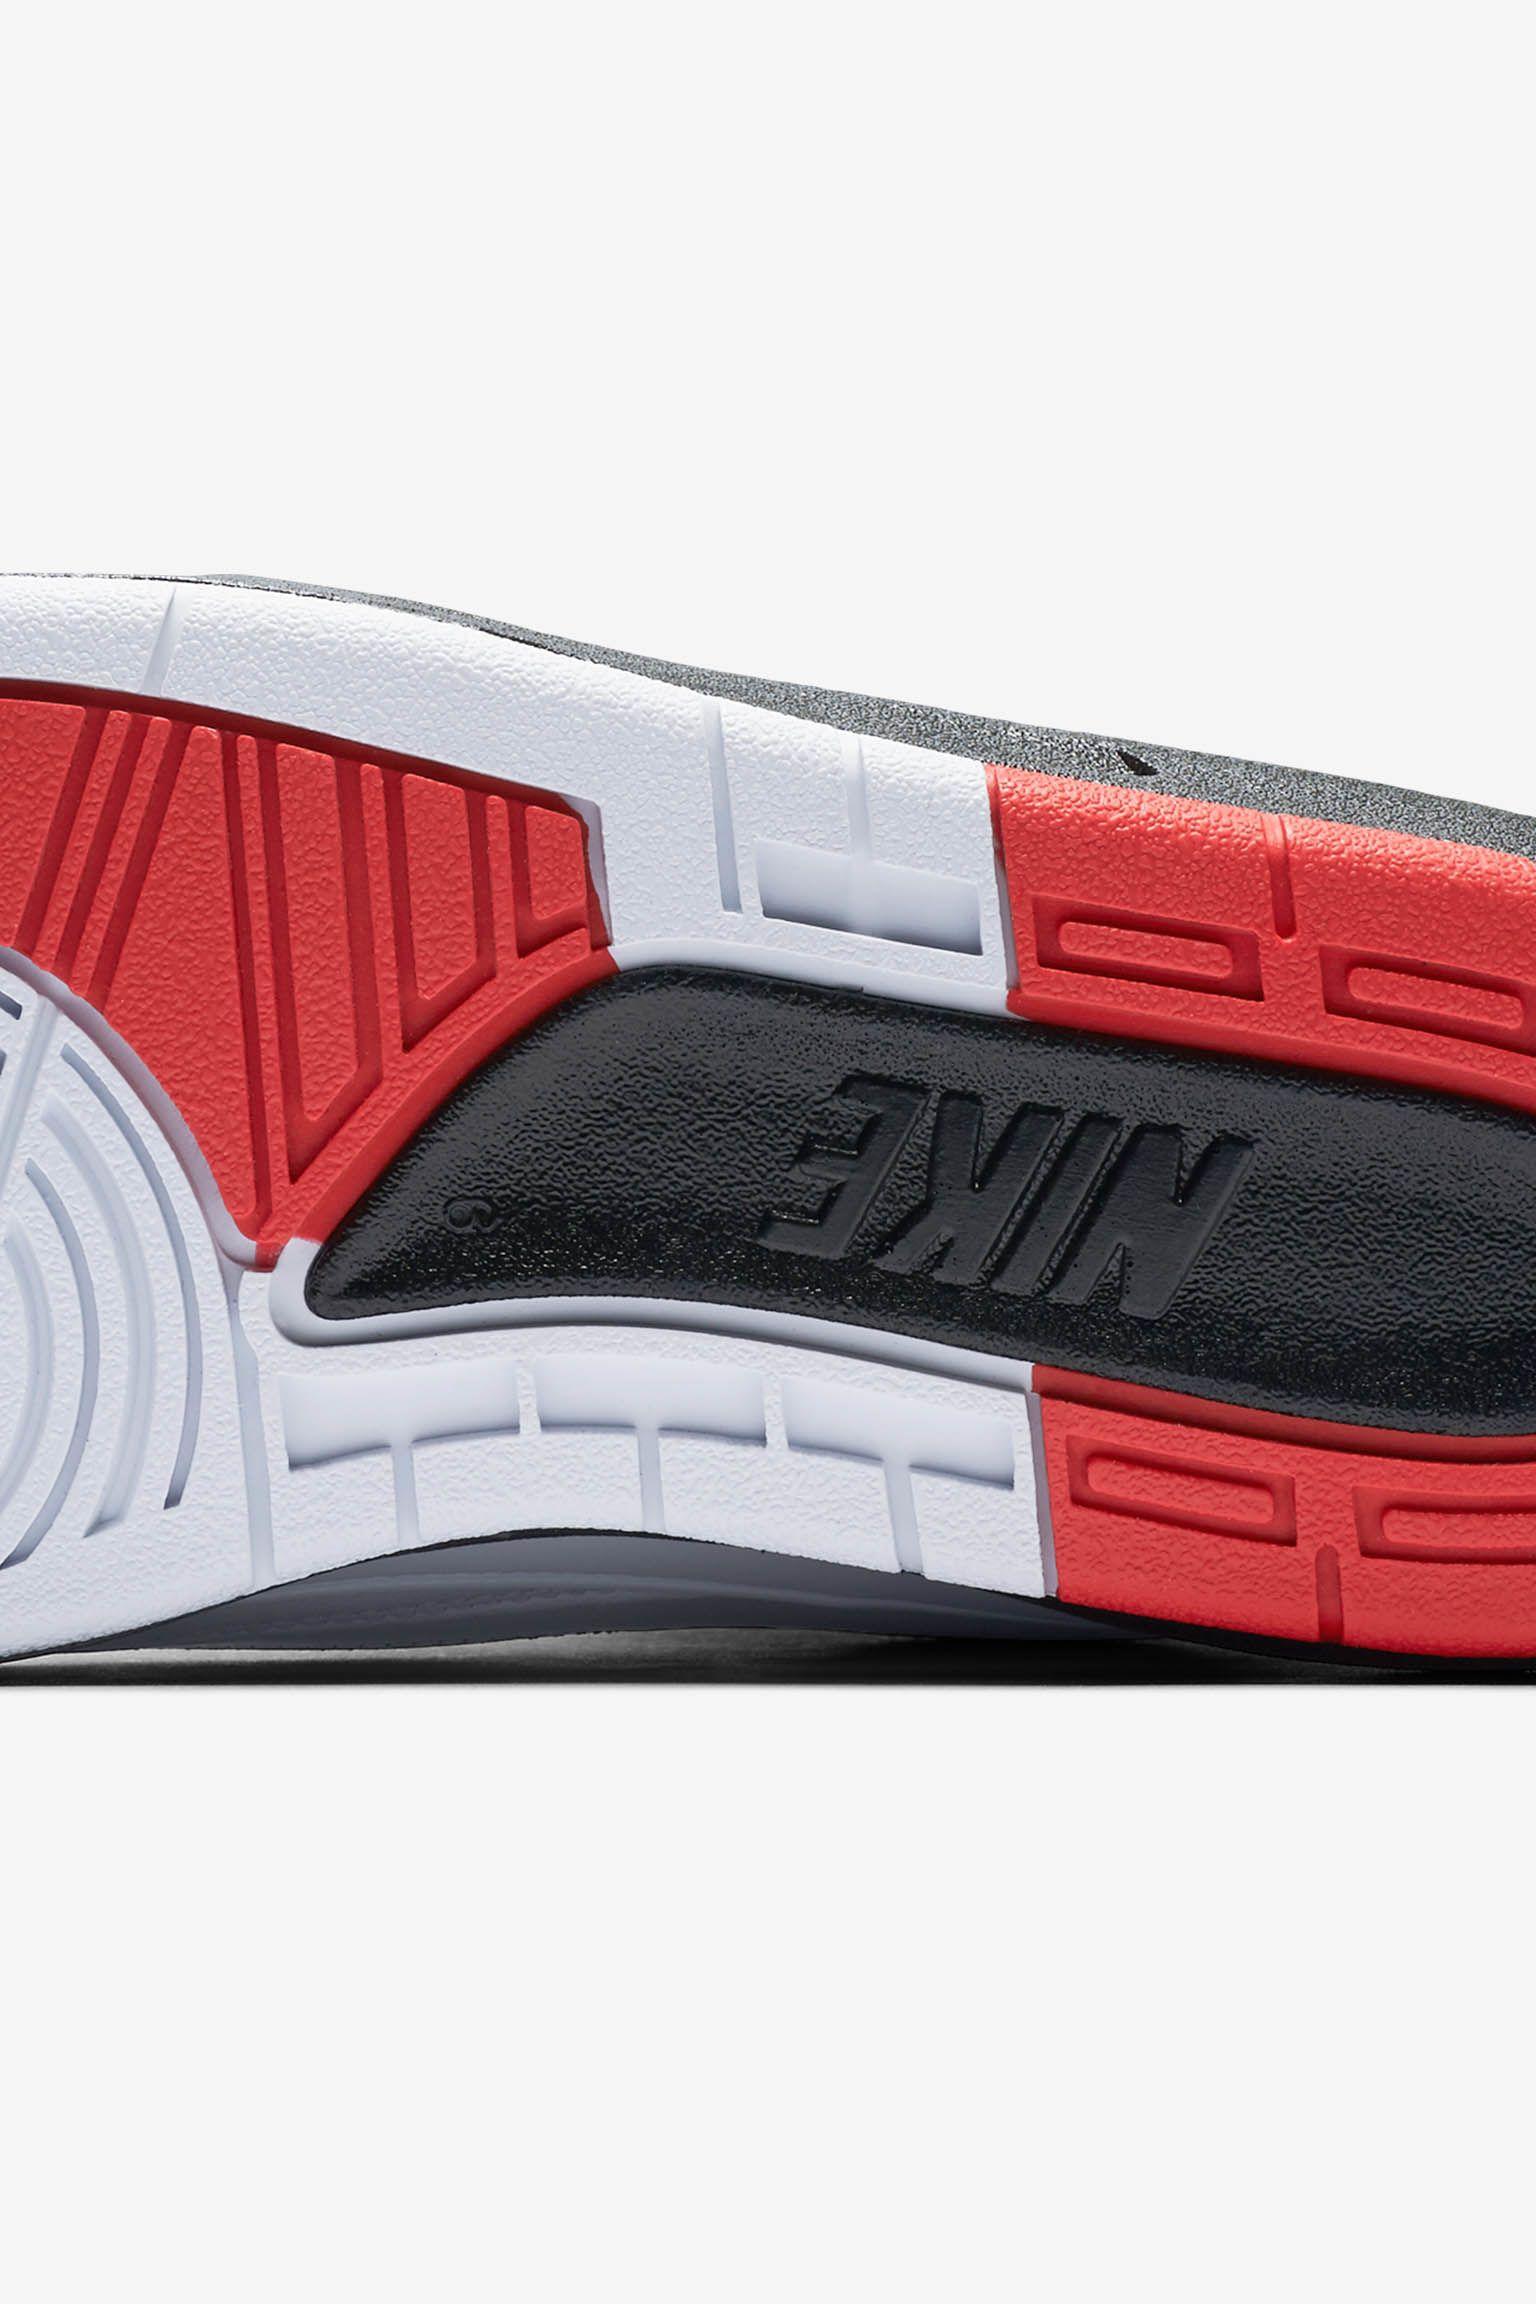 Air Jordan x Converse Pack 2017 Release Date